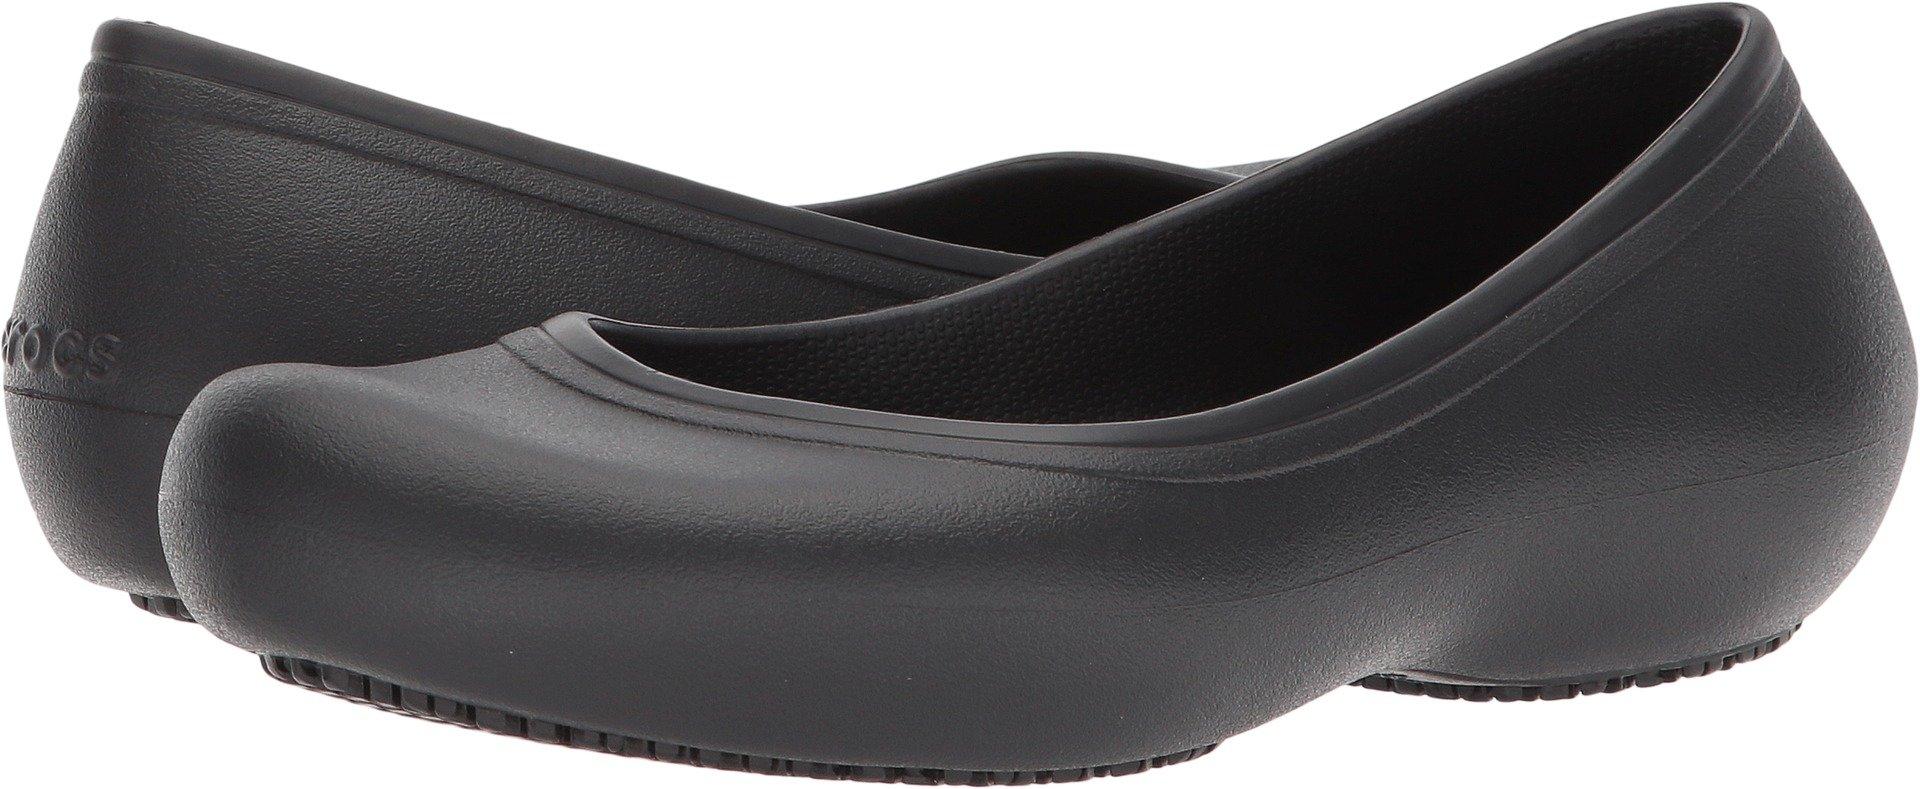 Crocs Women's Work Flat Food Service Shoe, Black, 7 M US